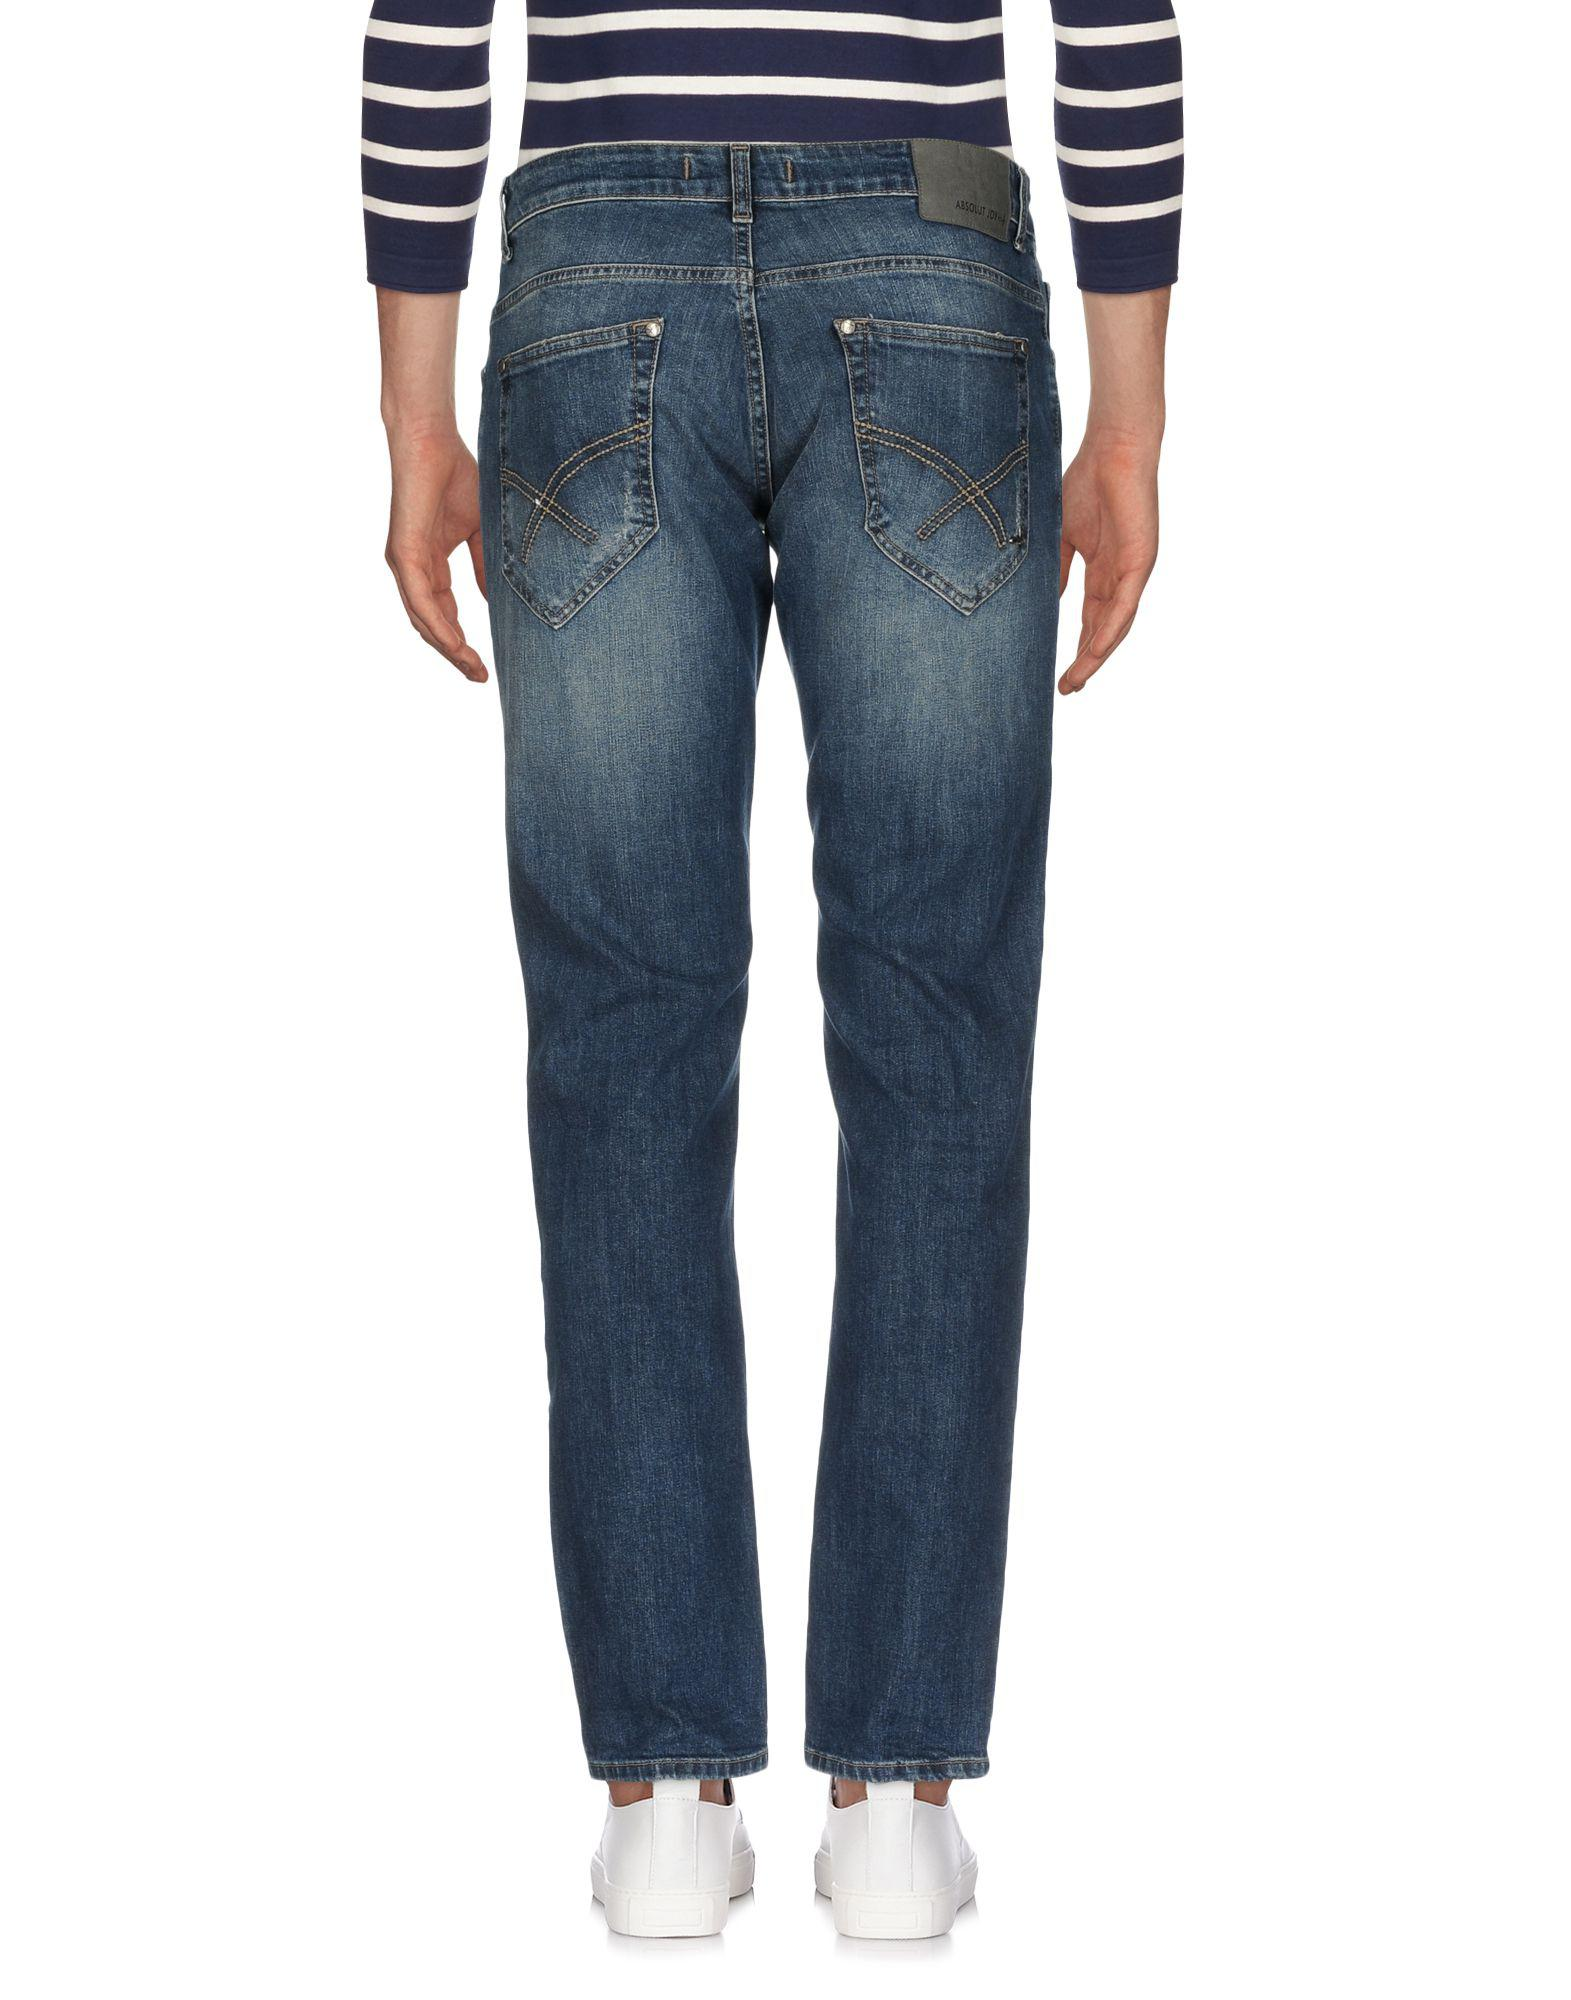 Joy Denim Trousers In For Men Lyst Absolut Blue E29IDH